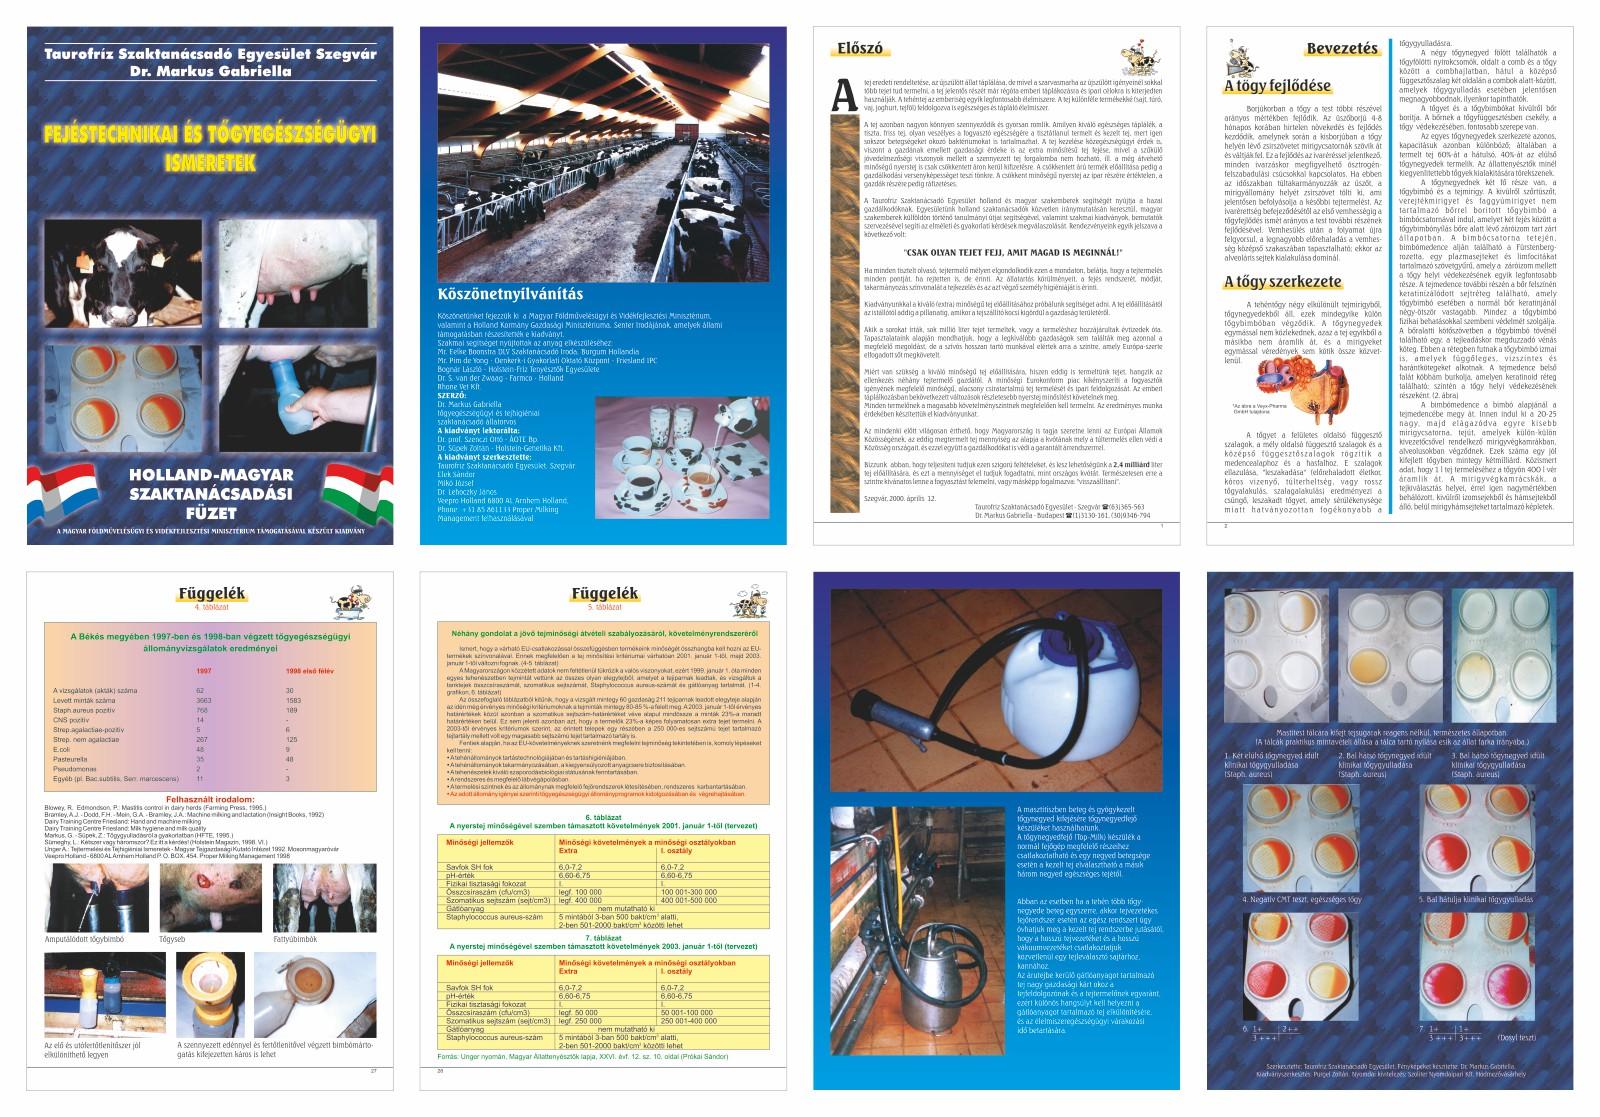 003-FejestechnikaiEsTogyegeszsegugyiIsmeretek-2000